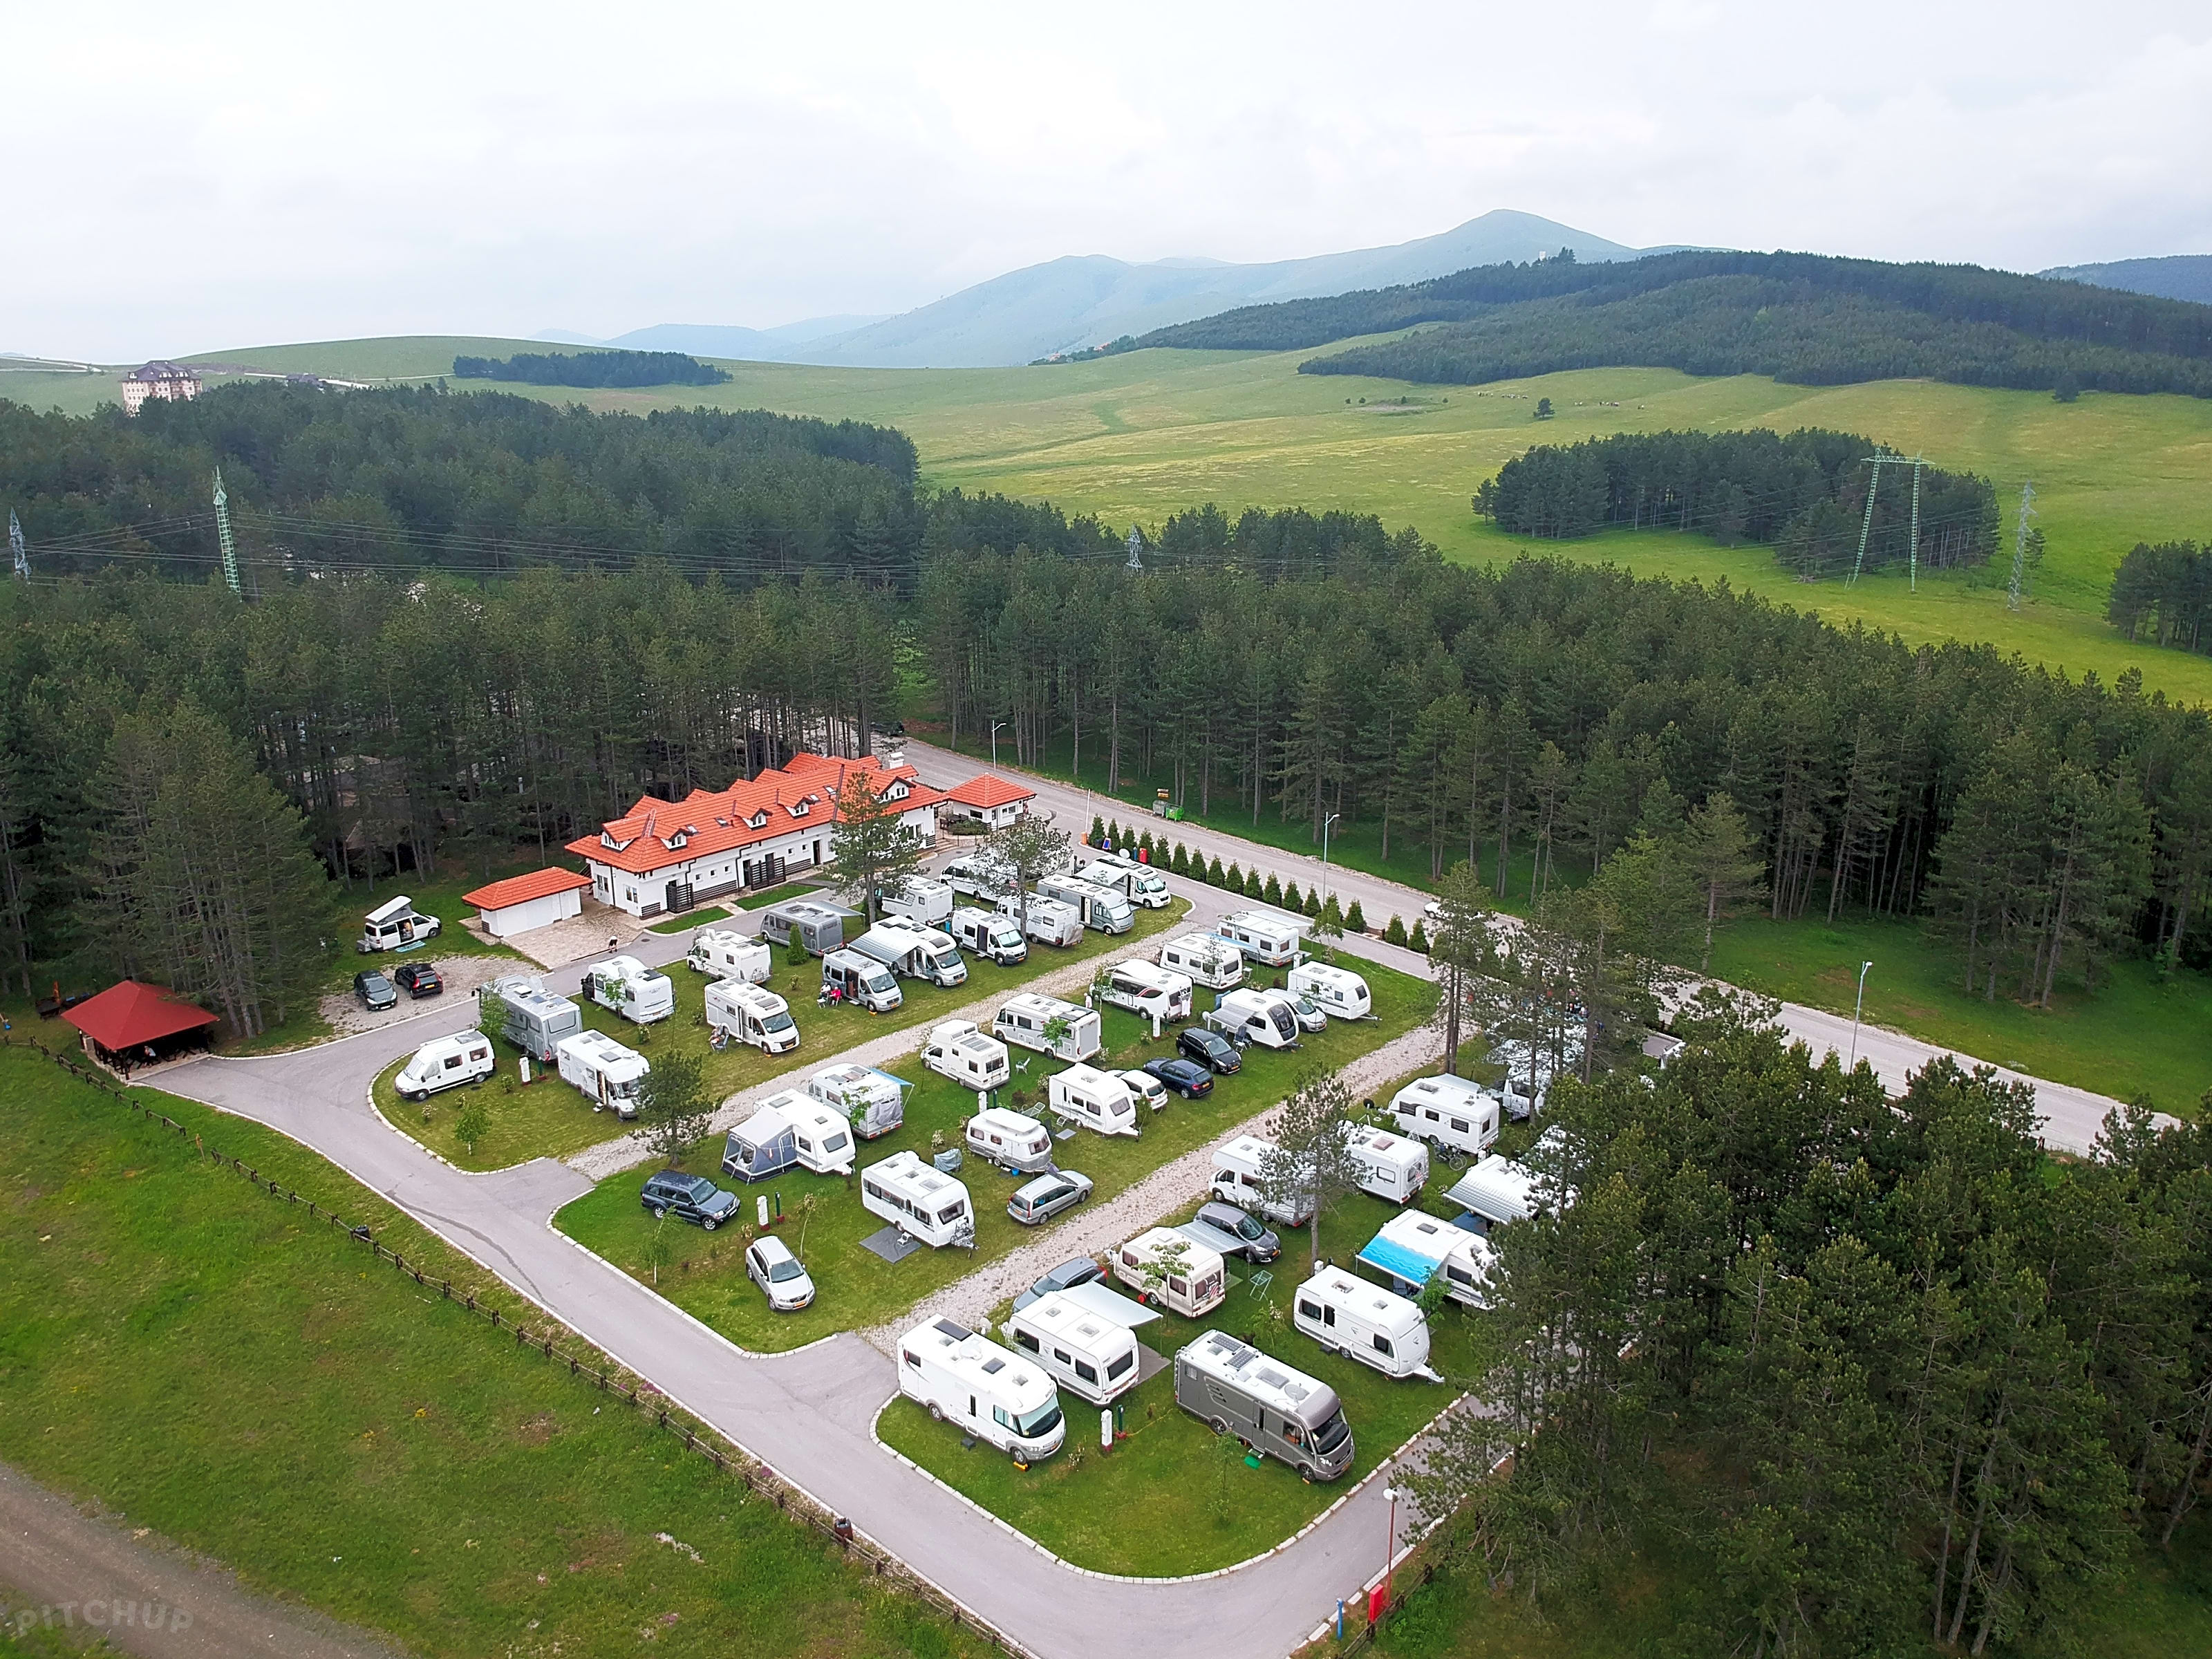 Camp Zlatibor Zlatibor Pitchup